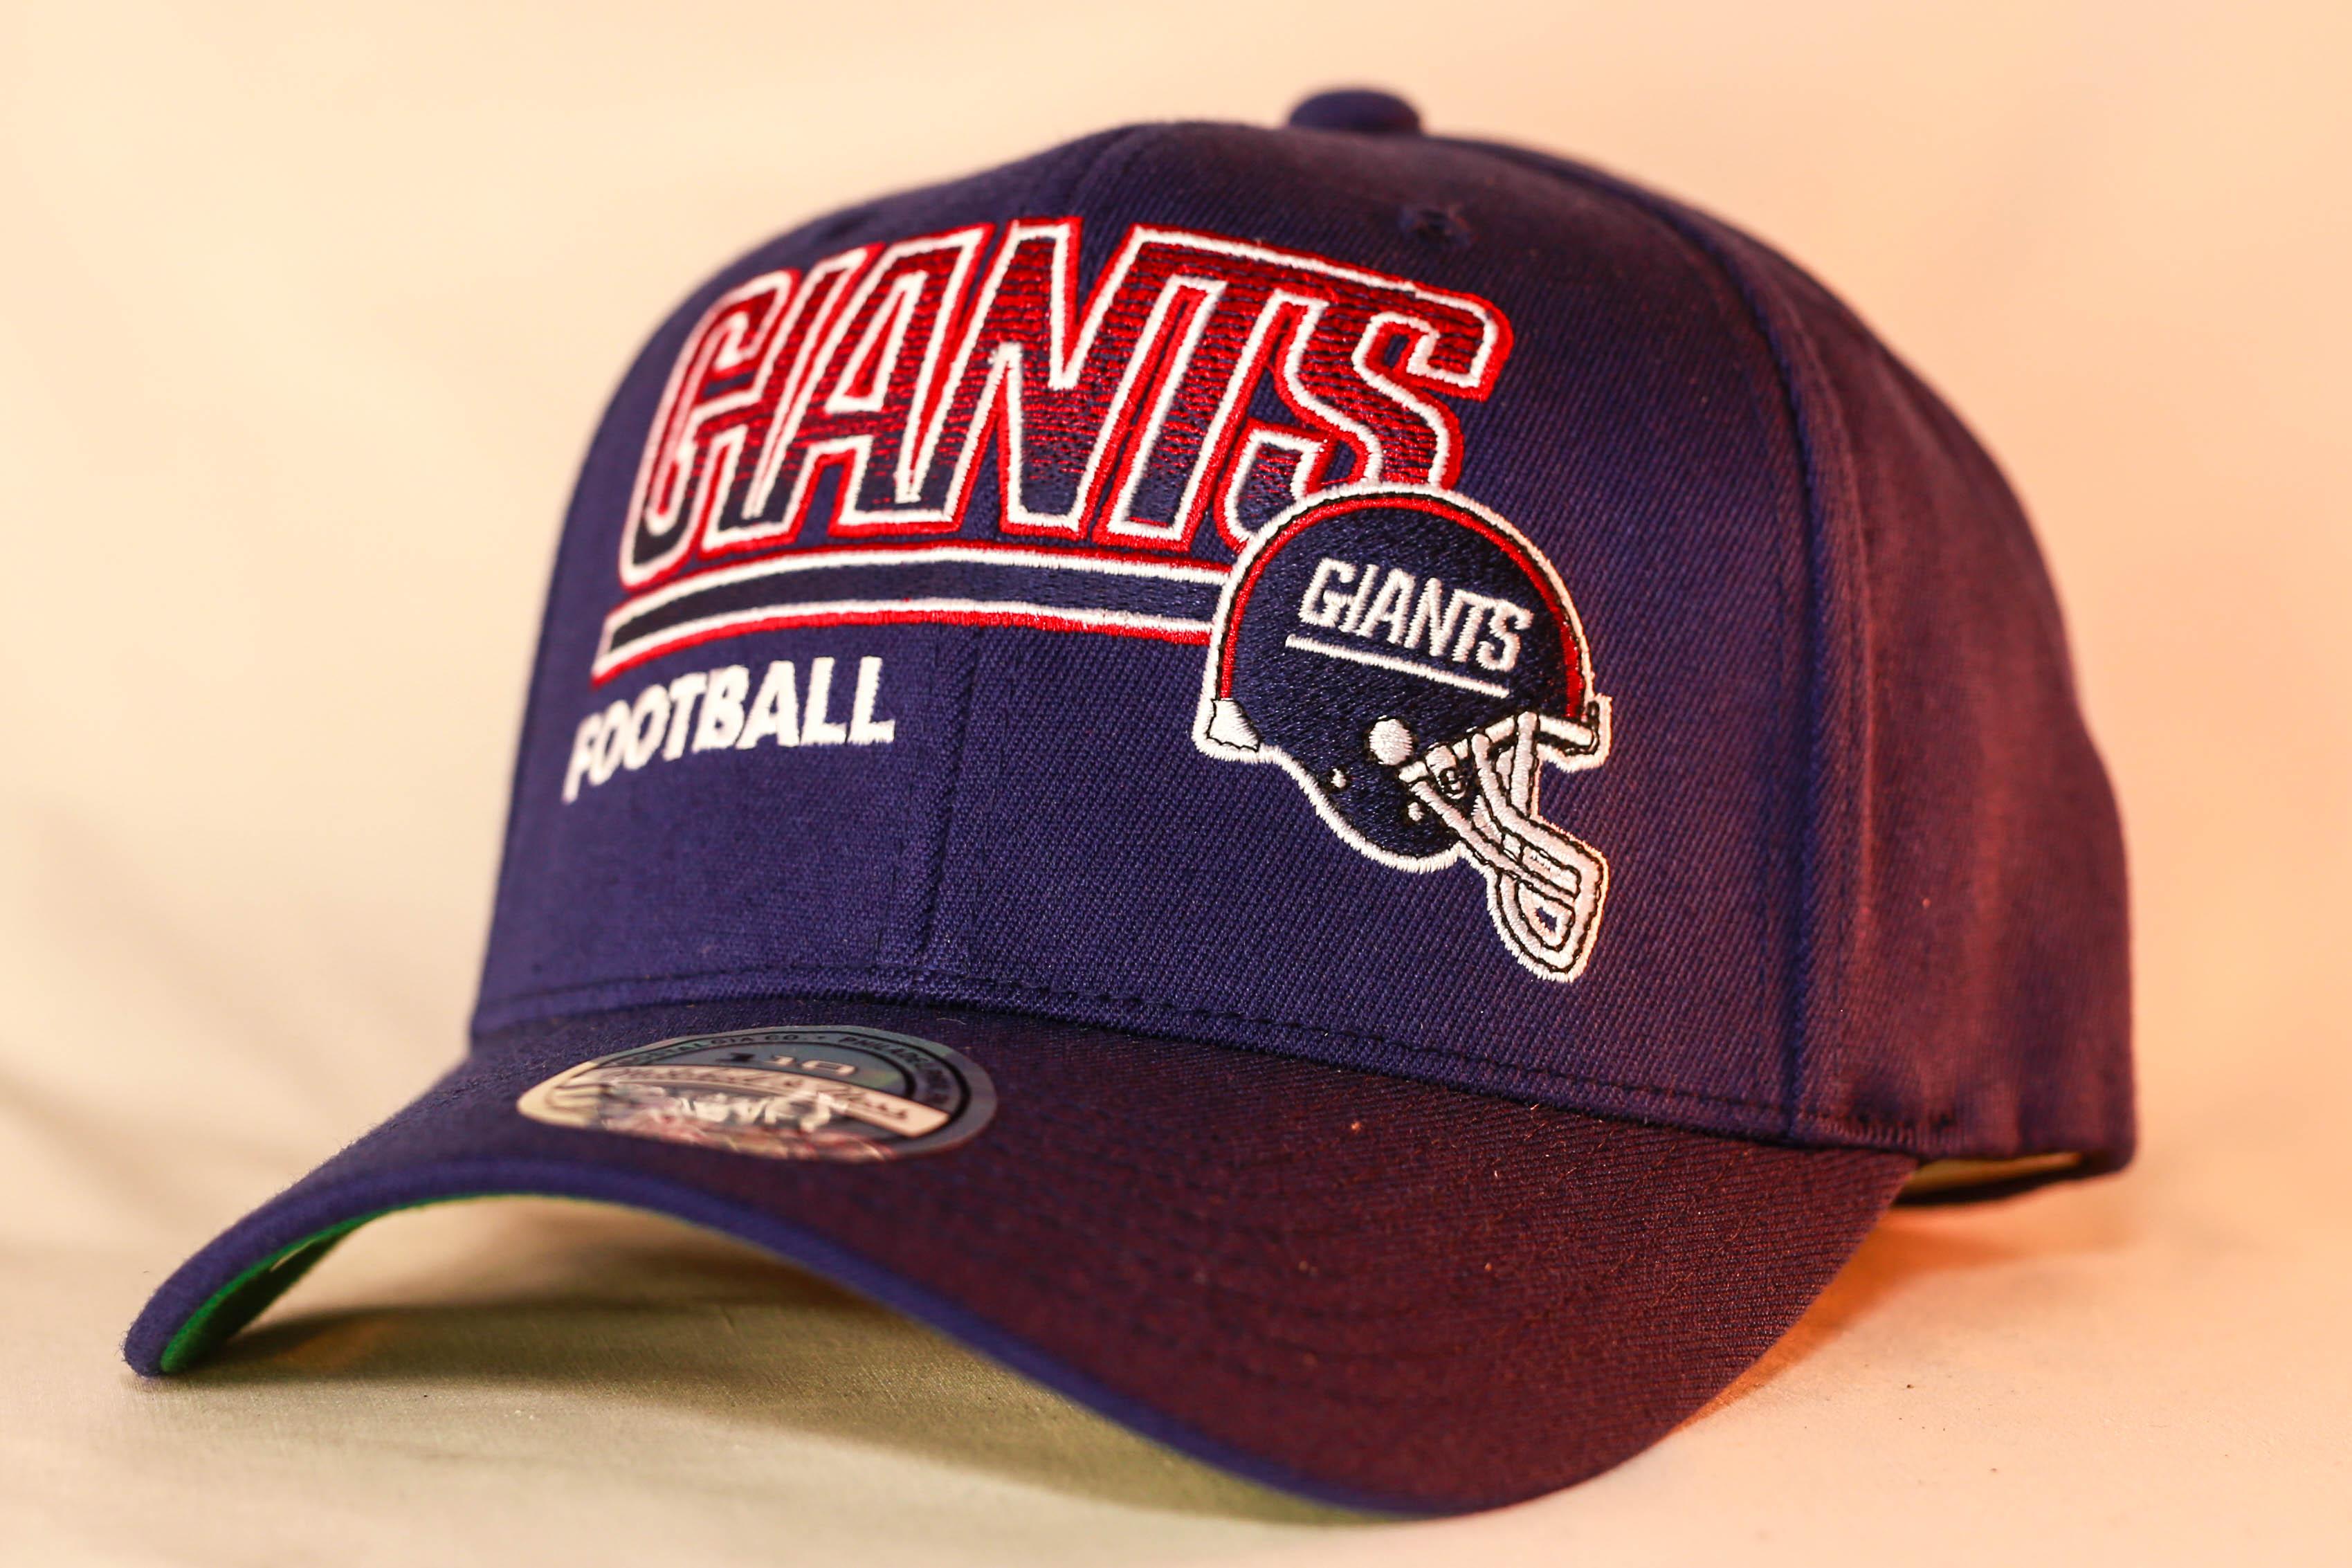 472cfeeed Mitchell & Ness Flexfit 110 Score Keeper Snapback Navy New York Giants  Men's & Women's